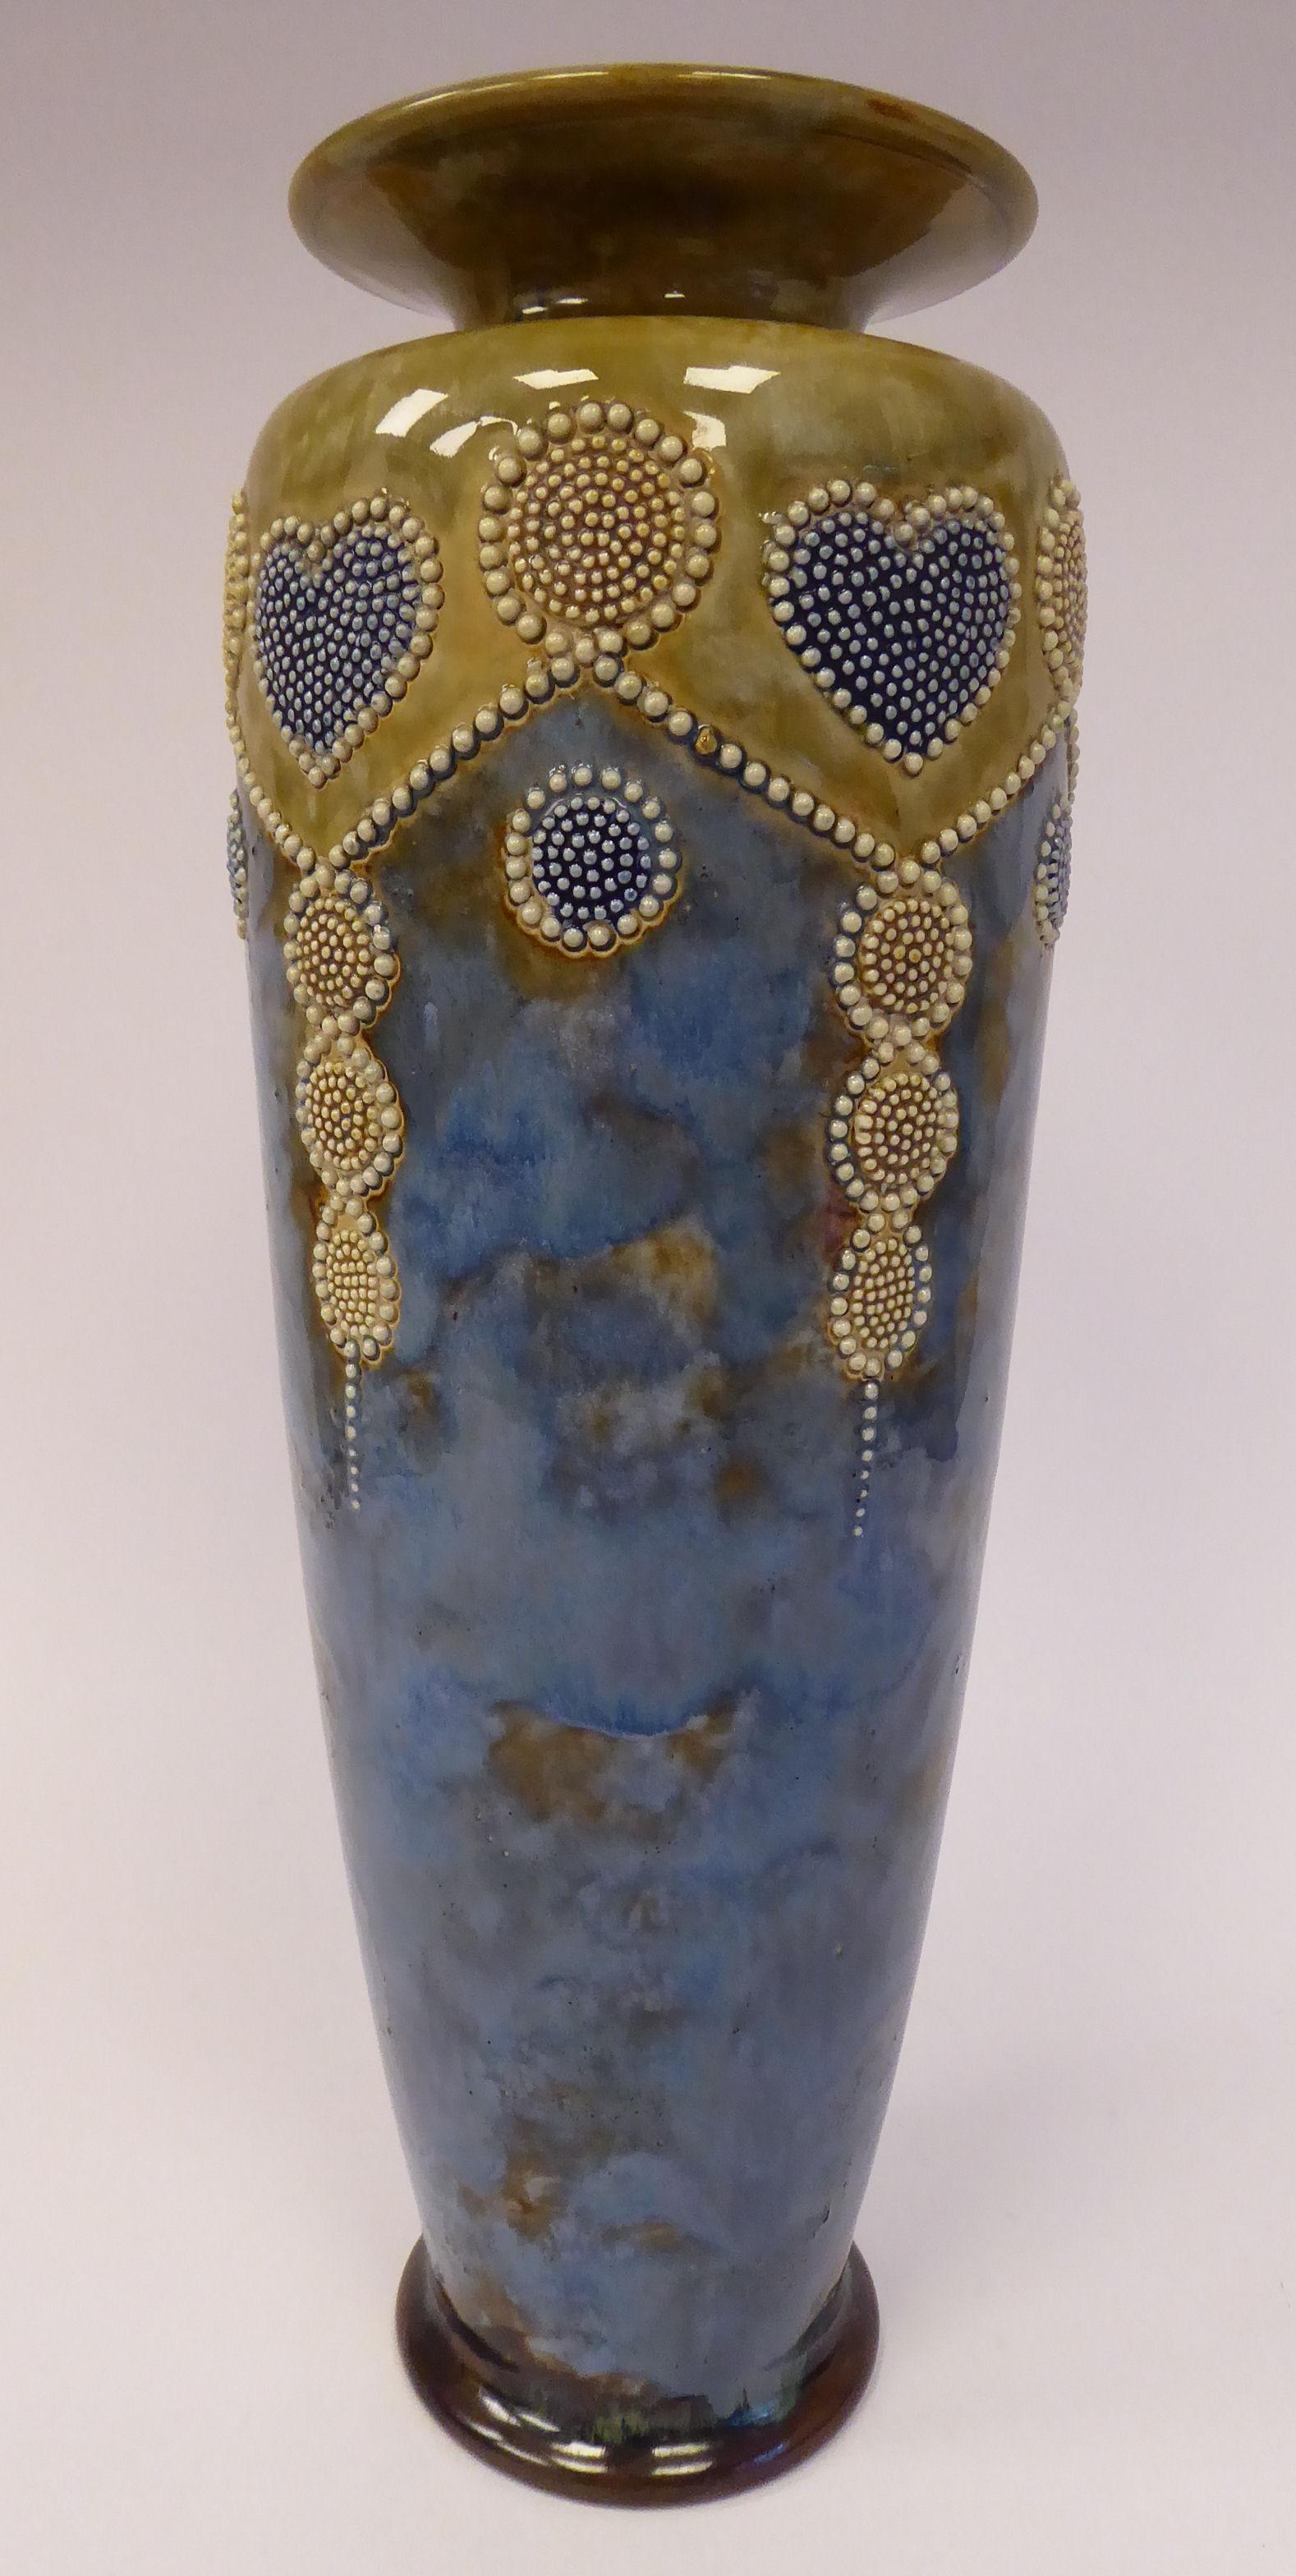 Lot 2 - An early 20thC Royal Doulton sponged blue, green and white glazed stoneware vase of slender,